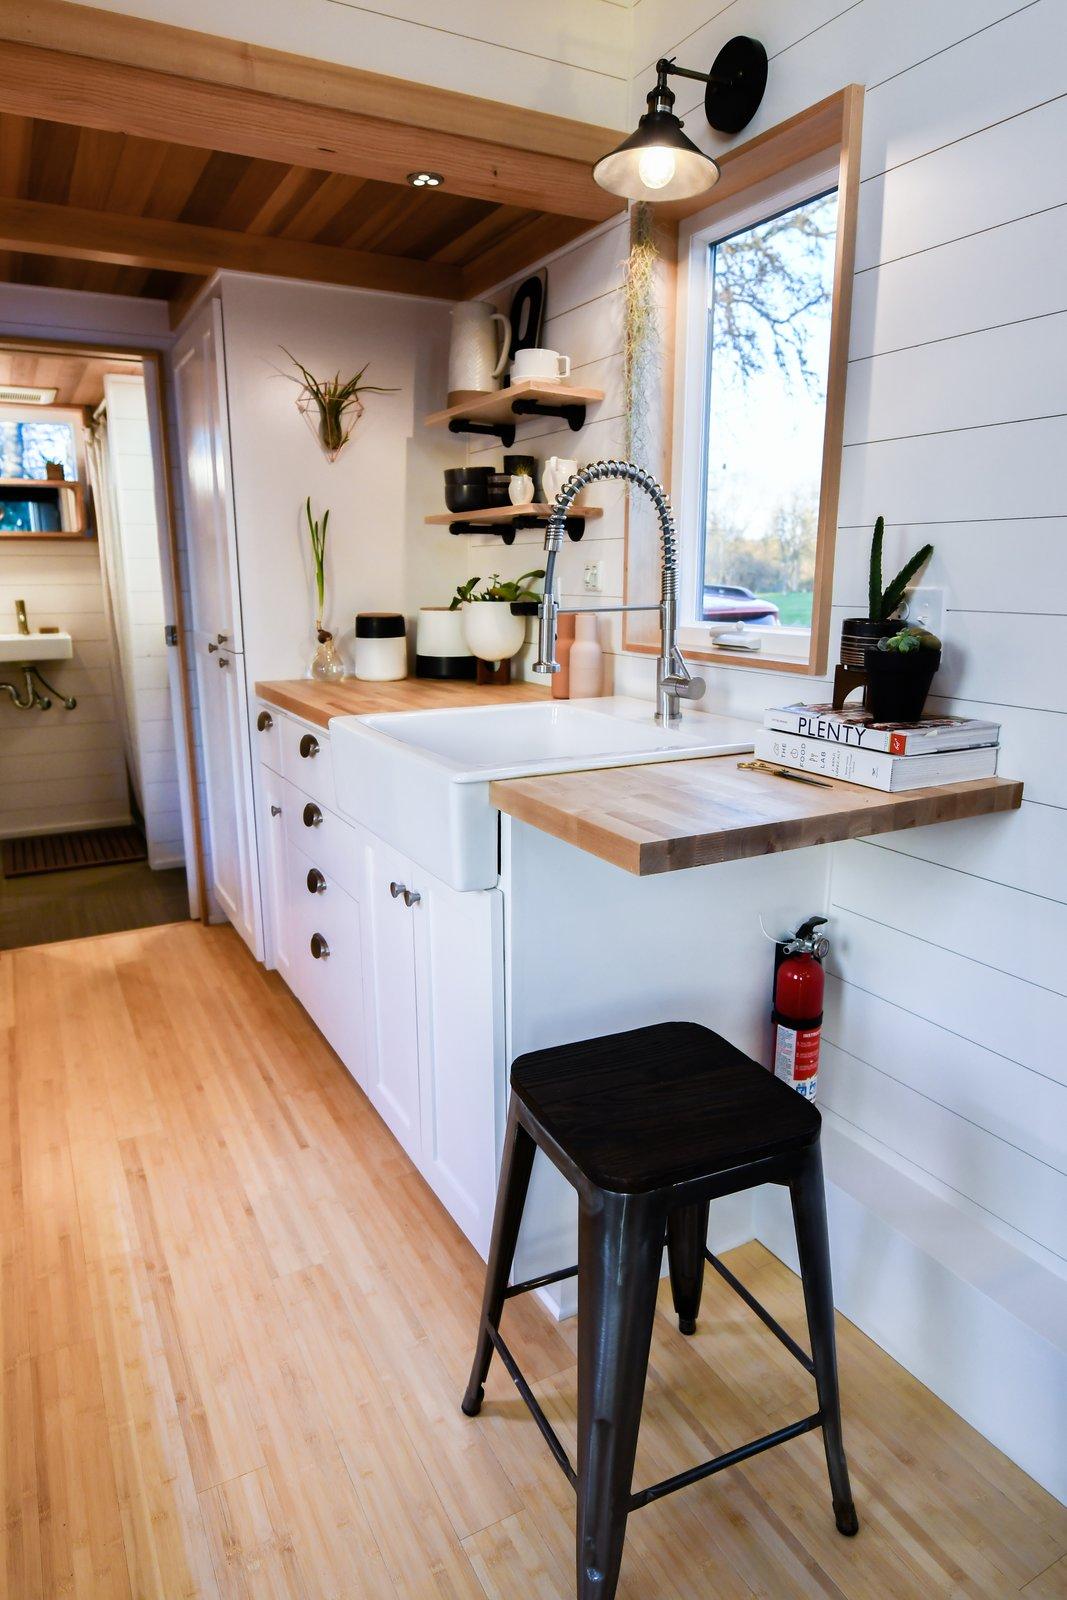 Urban Payette tiny home kitchen